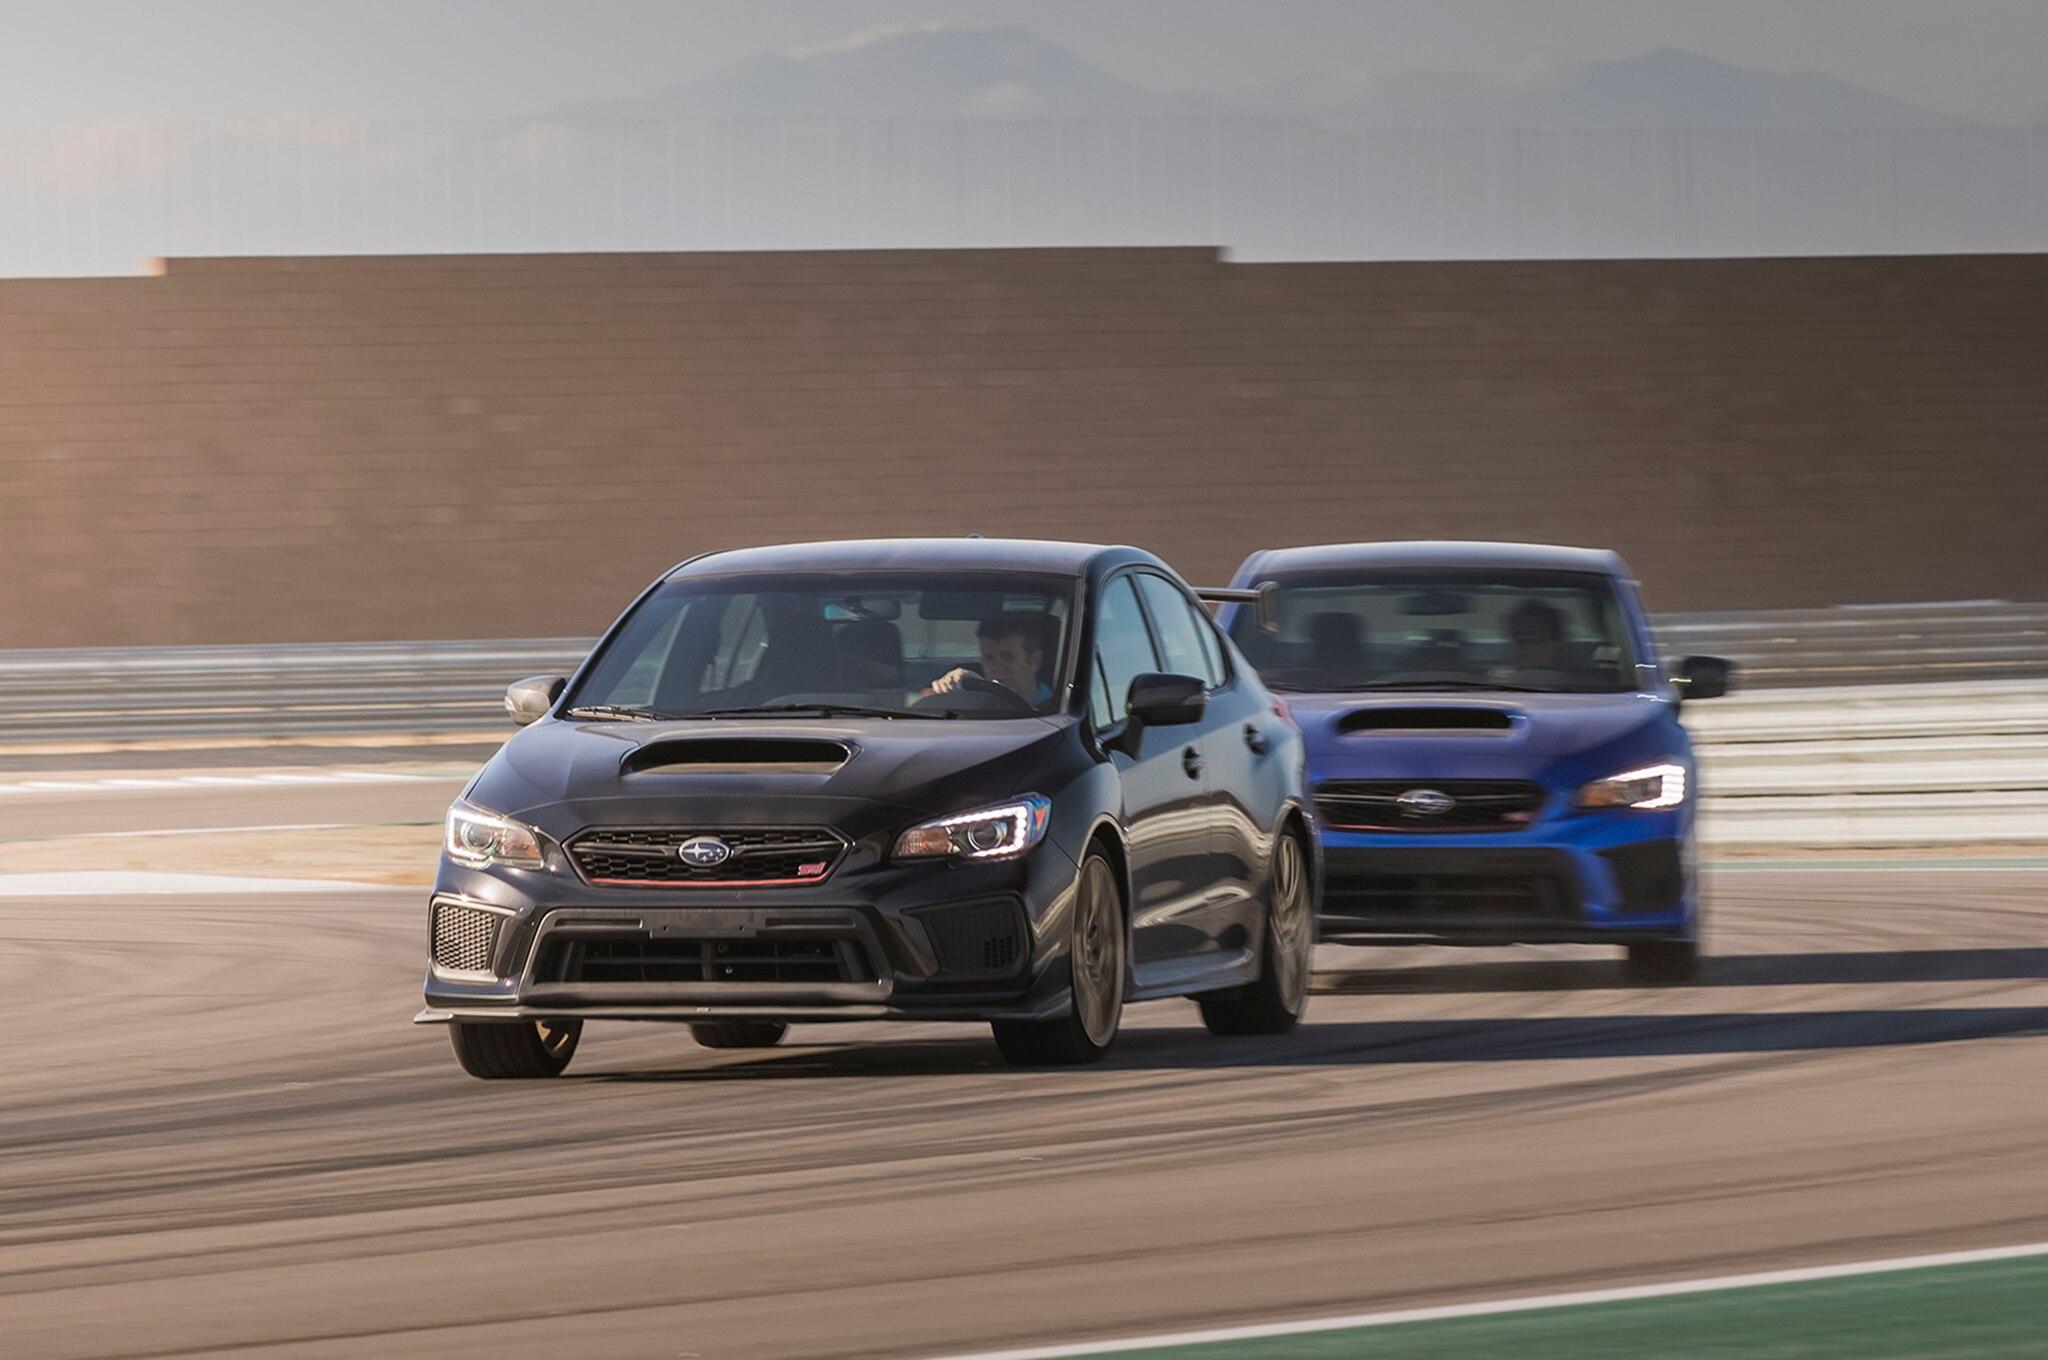 Subaru Wrx Sti 0-60 >> 2018 Subaru Wrx Sti Type Ra First Drive Review Automobile Magazine